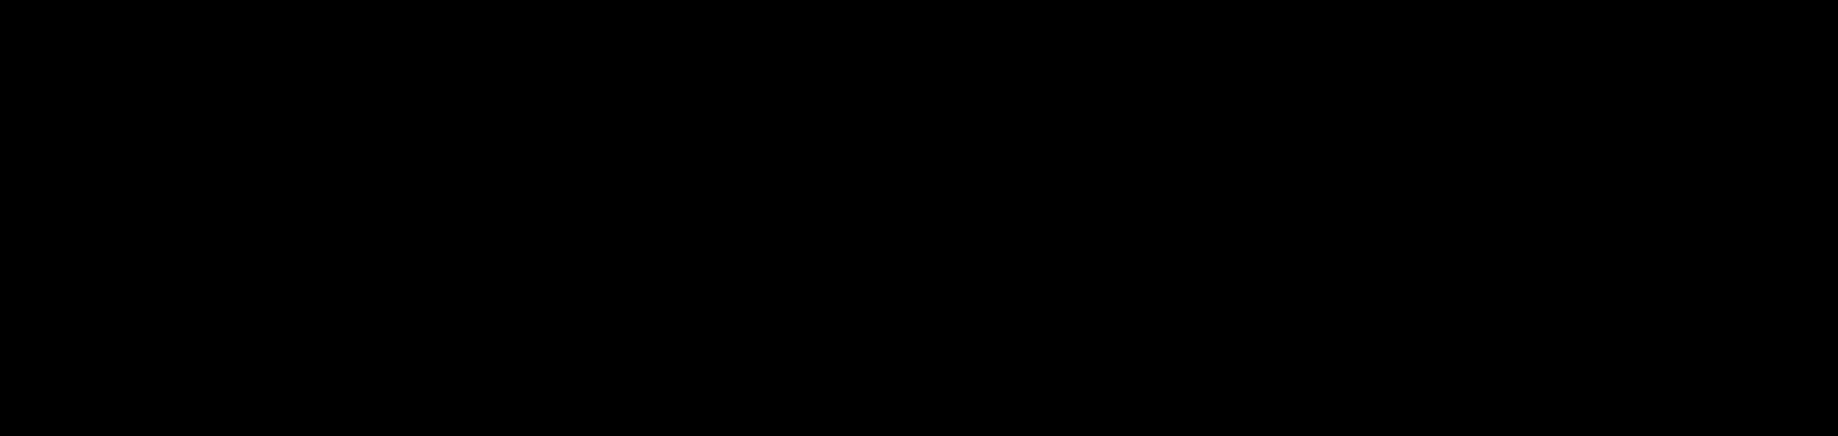 Resorufin β-D-glucuronide sodium salt